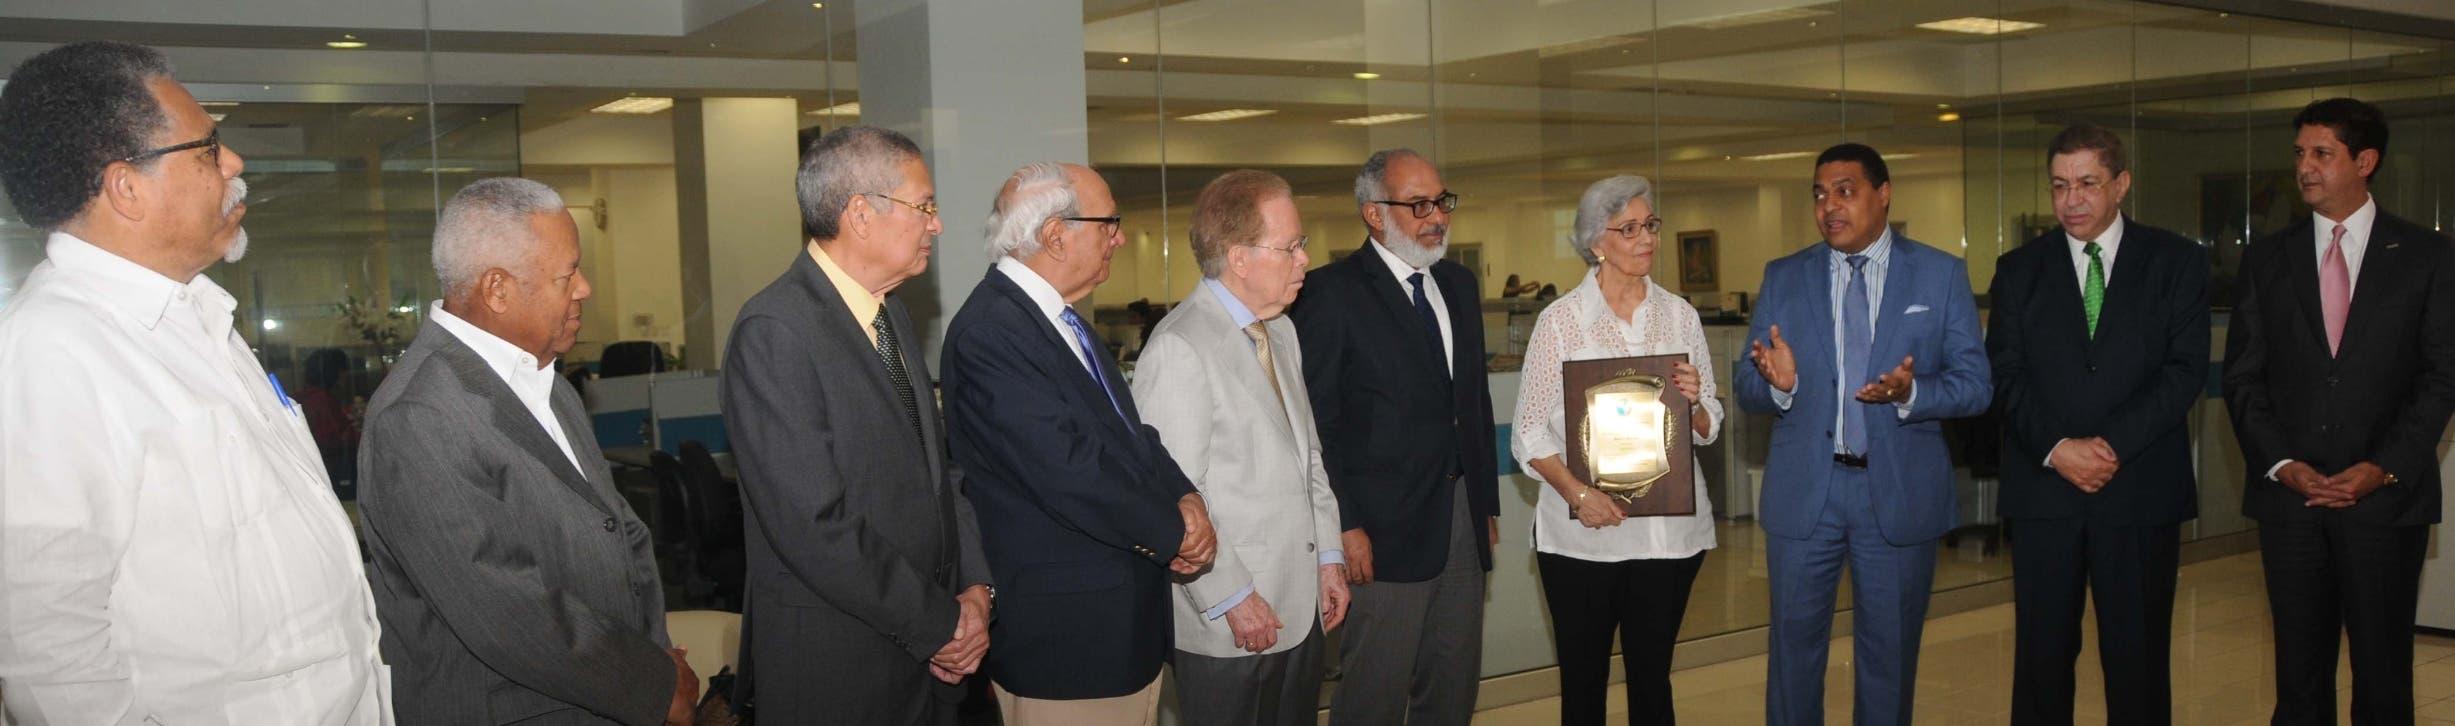 Sociedad Dominicana de Diarios rinde tributo a Molina Morillo